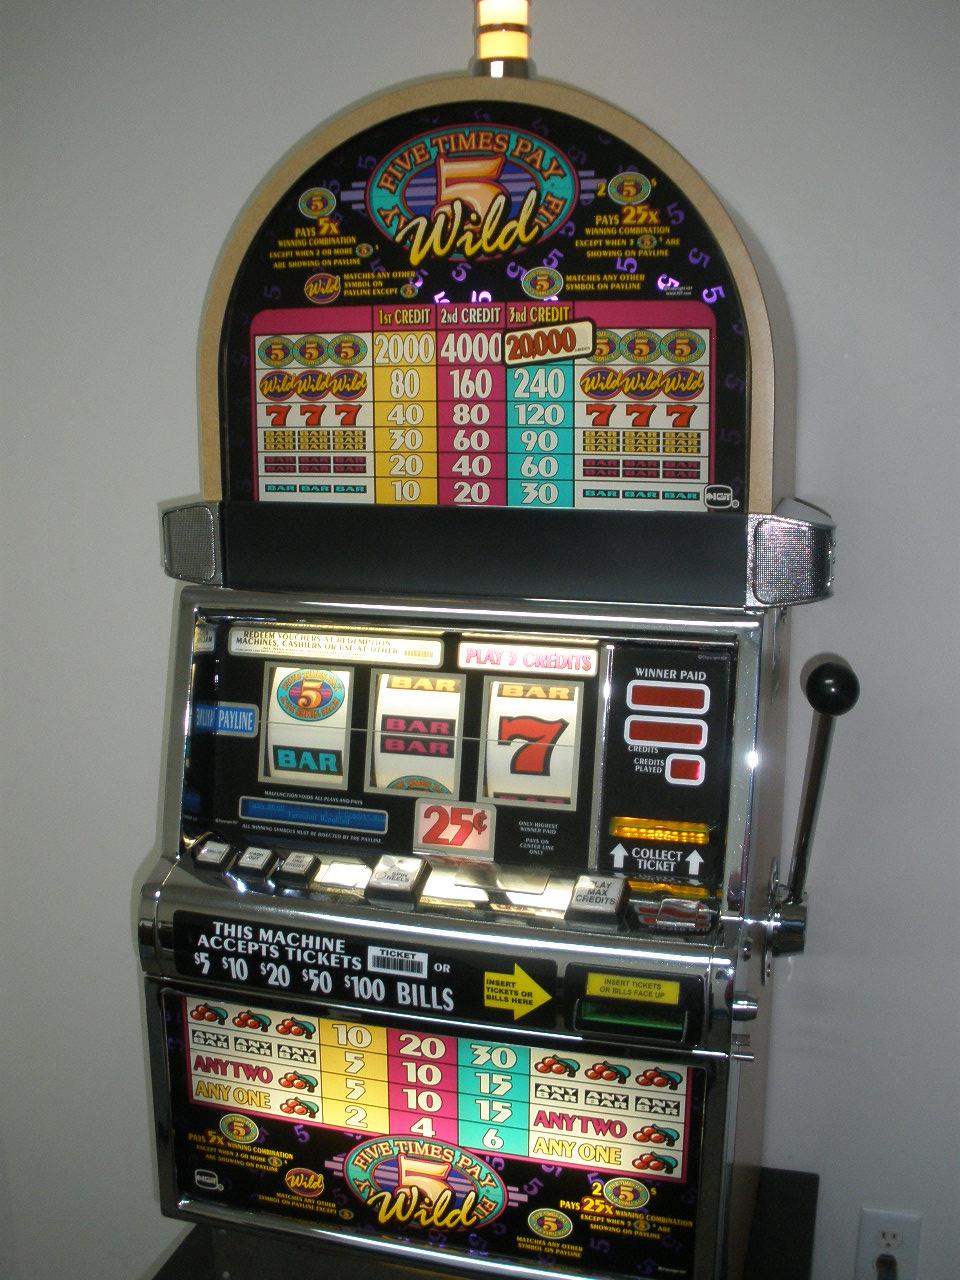 IGT FIVE TIMES PAY WILD S2000 SLOT MACHINE For Sale \u2022 Gambler\u0026#39;s Oasis USA